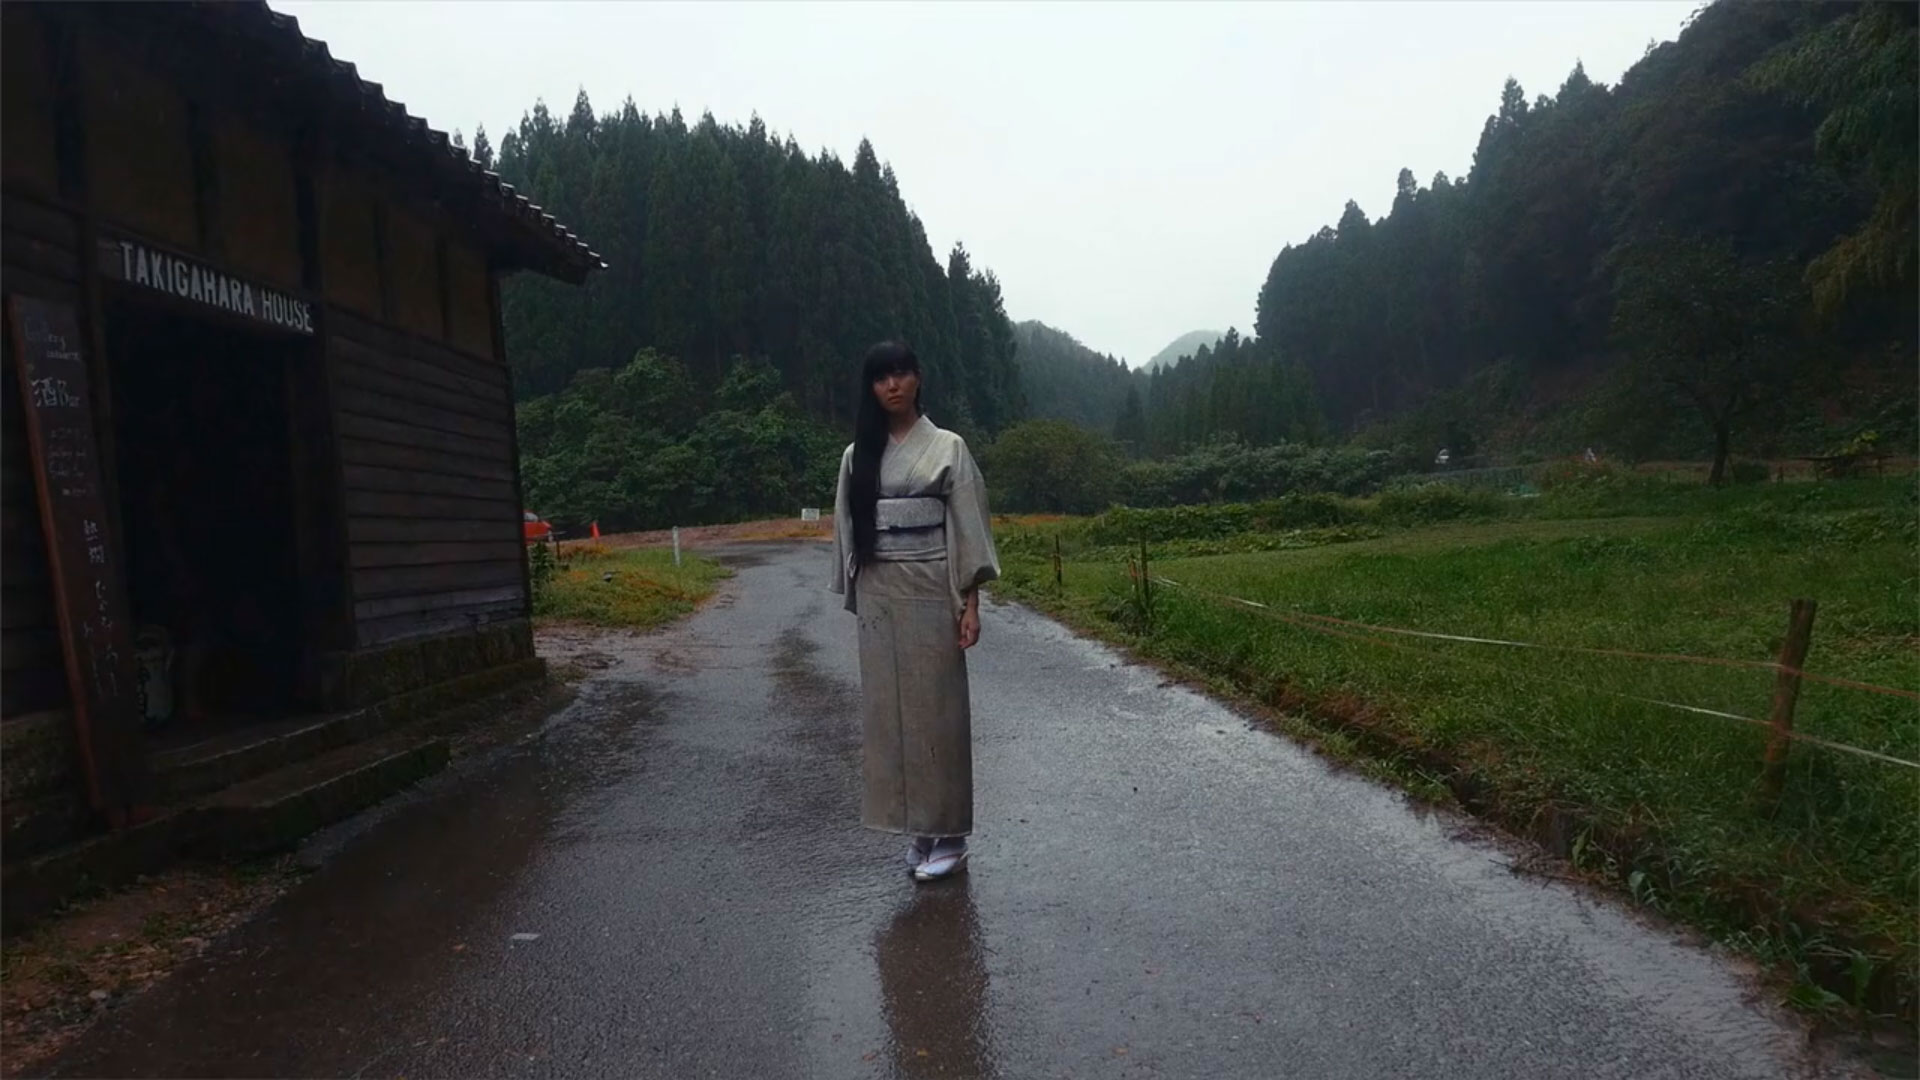 MAMI PRESENTS CALLIGRAF2ITY TAKIGAHARA